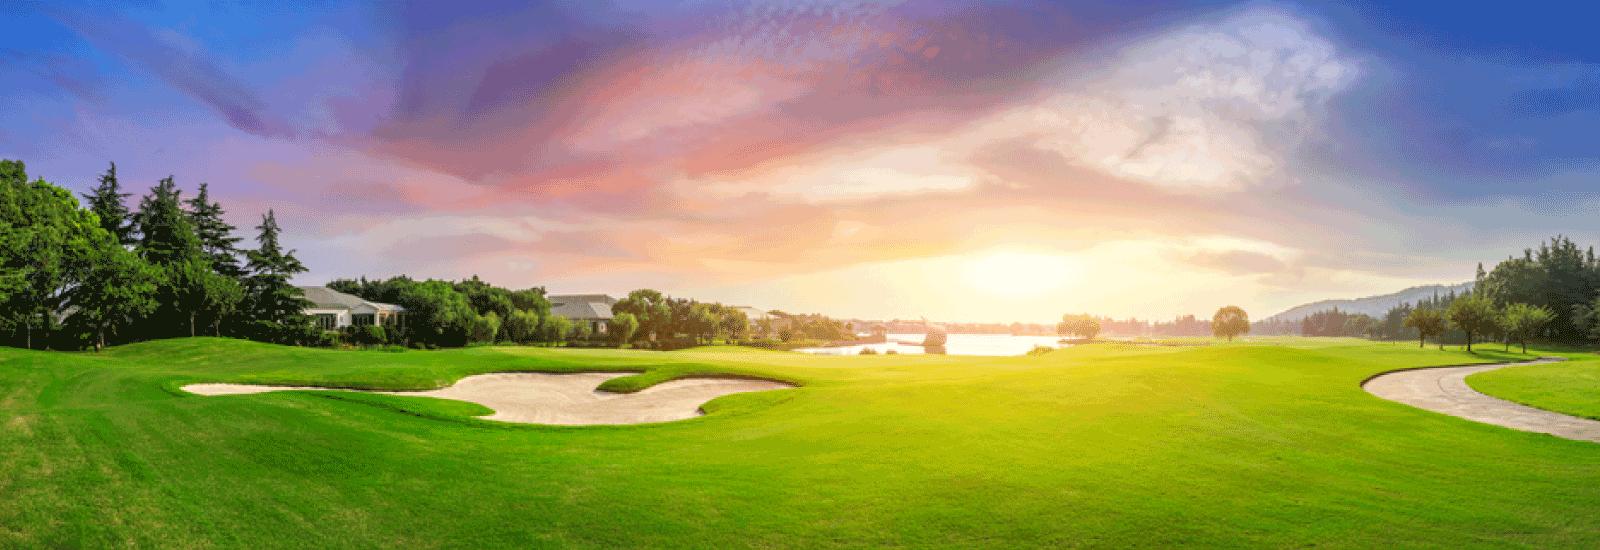 Buckley AFB Golf Course